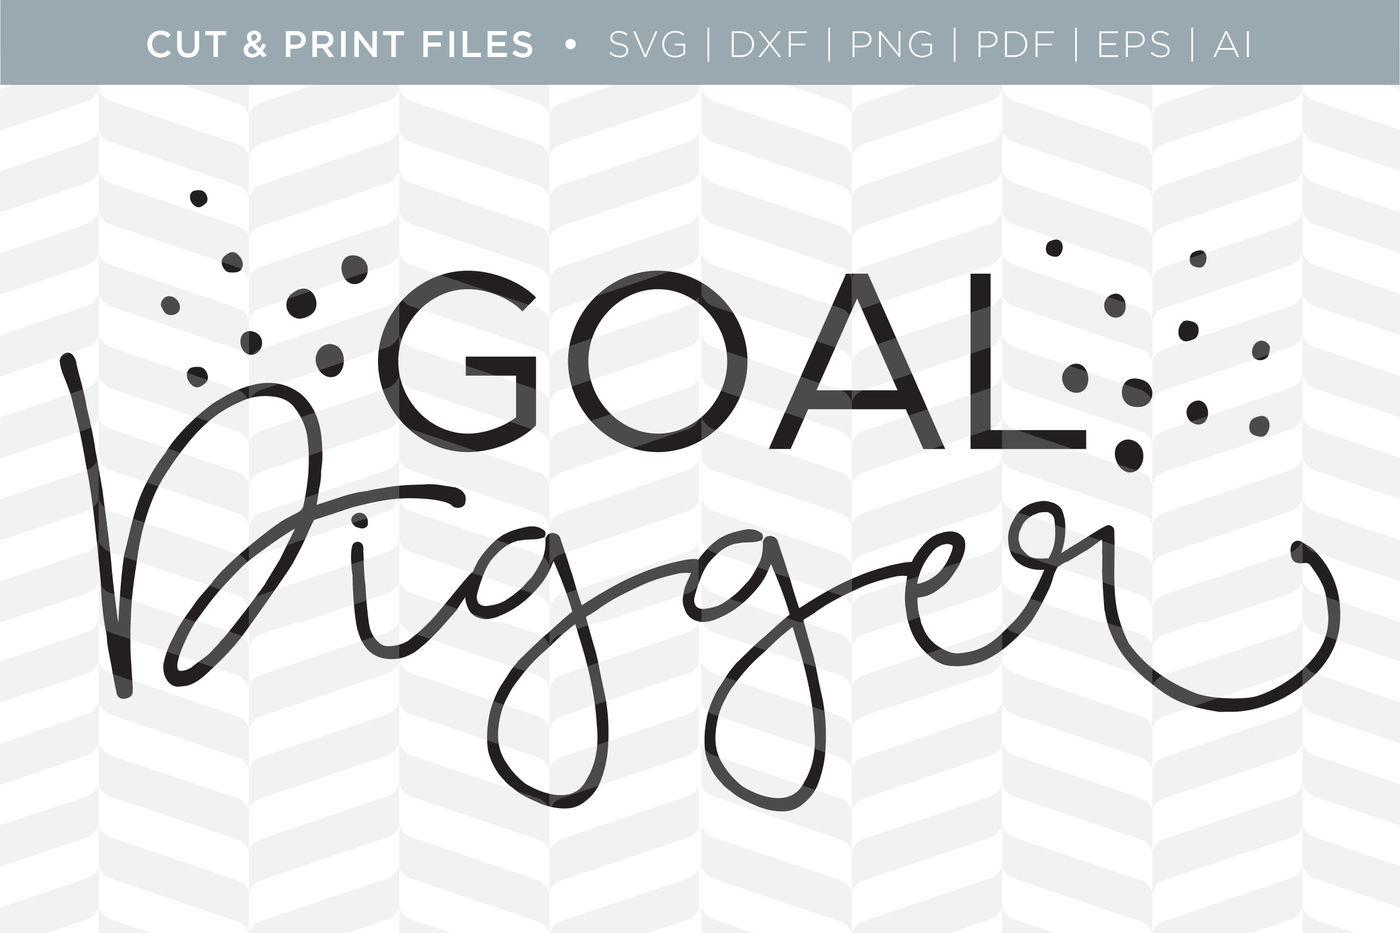 46+ Goal Digger – Dxf/Svg/Png/Pdf Cut & Print Files Crafter Files